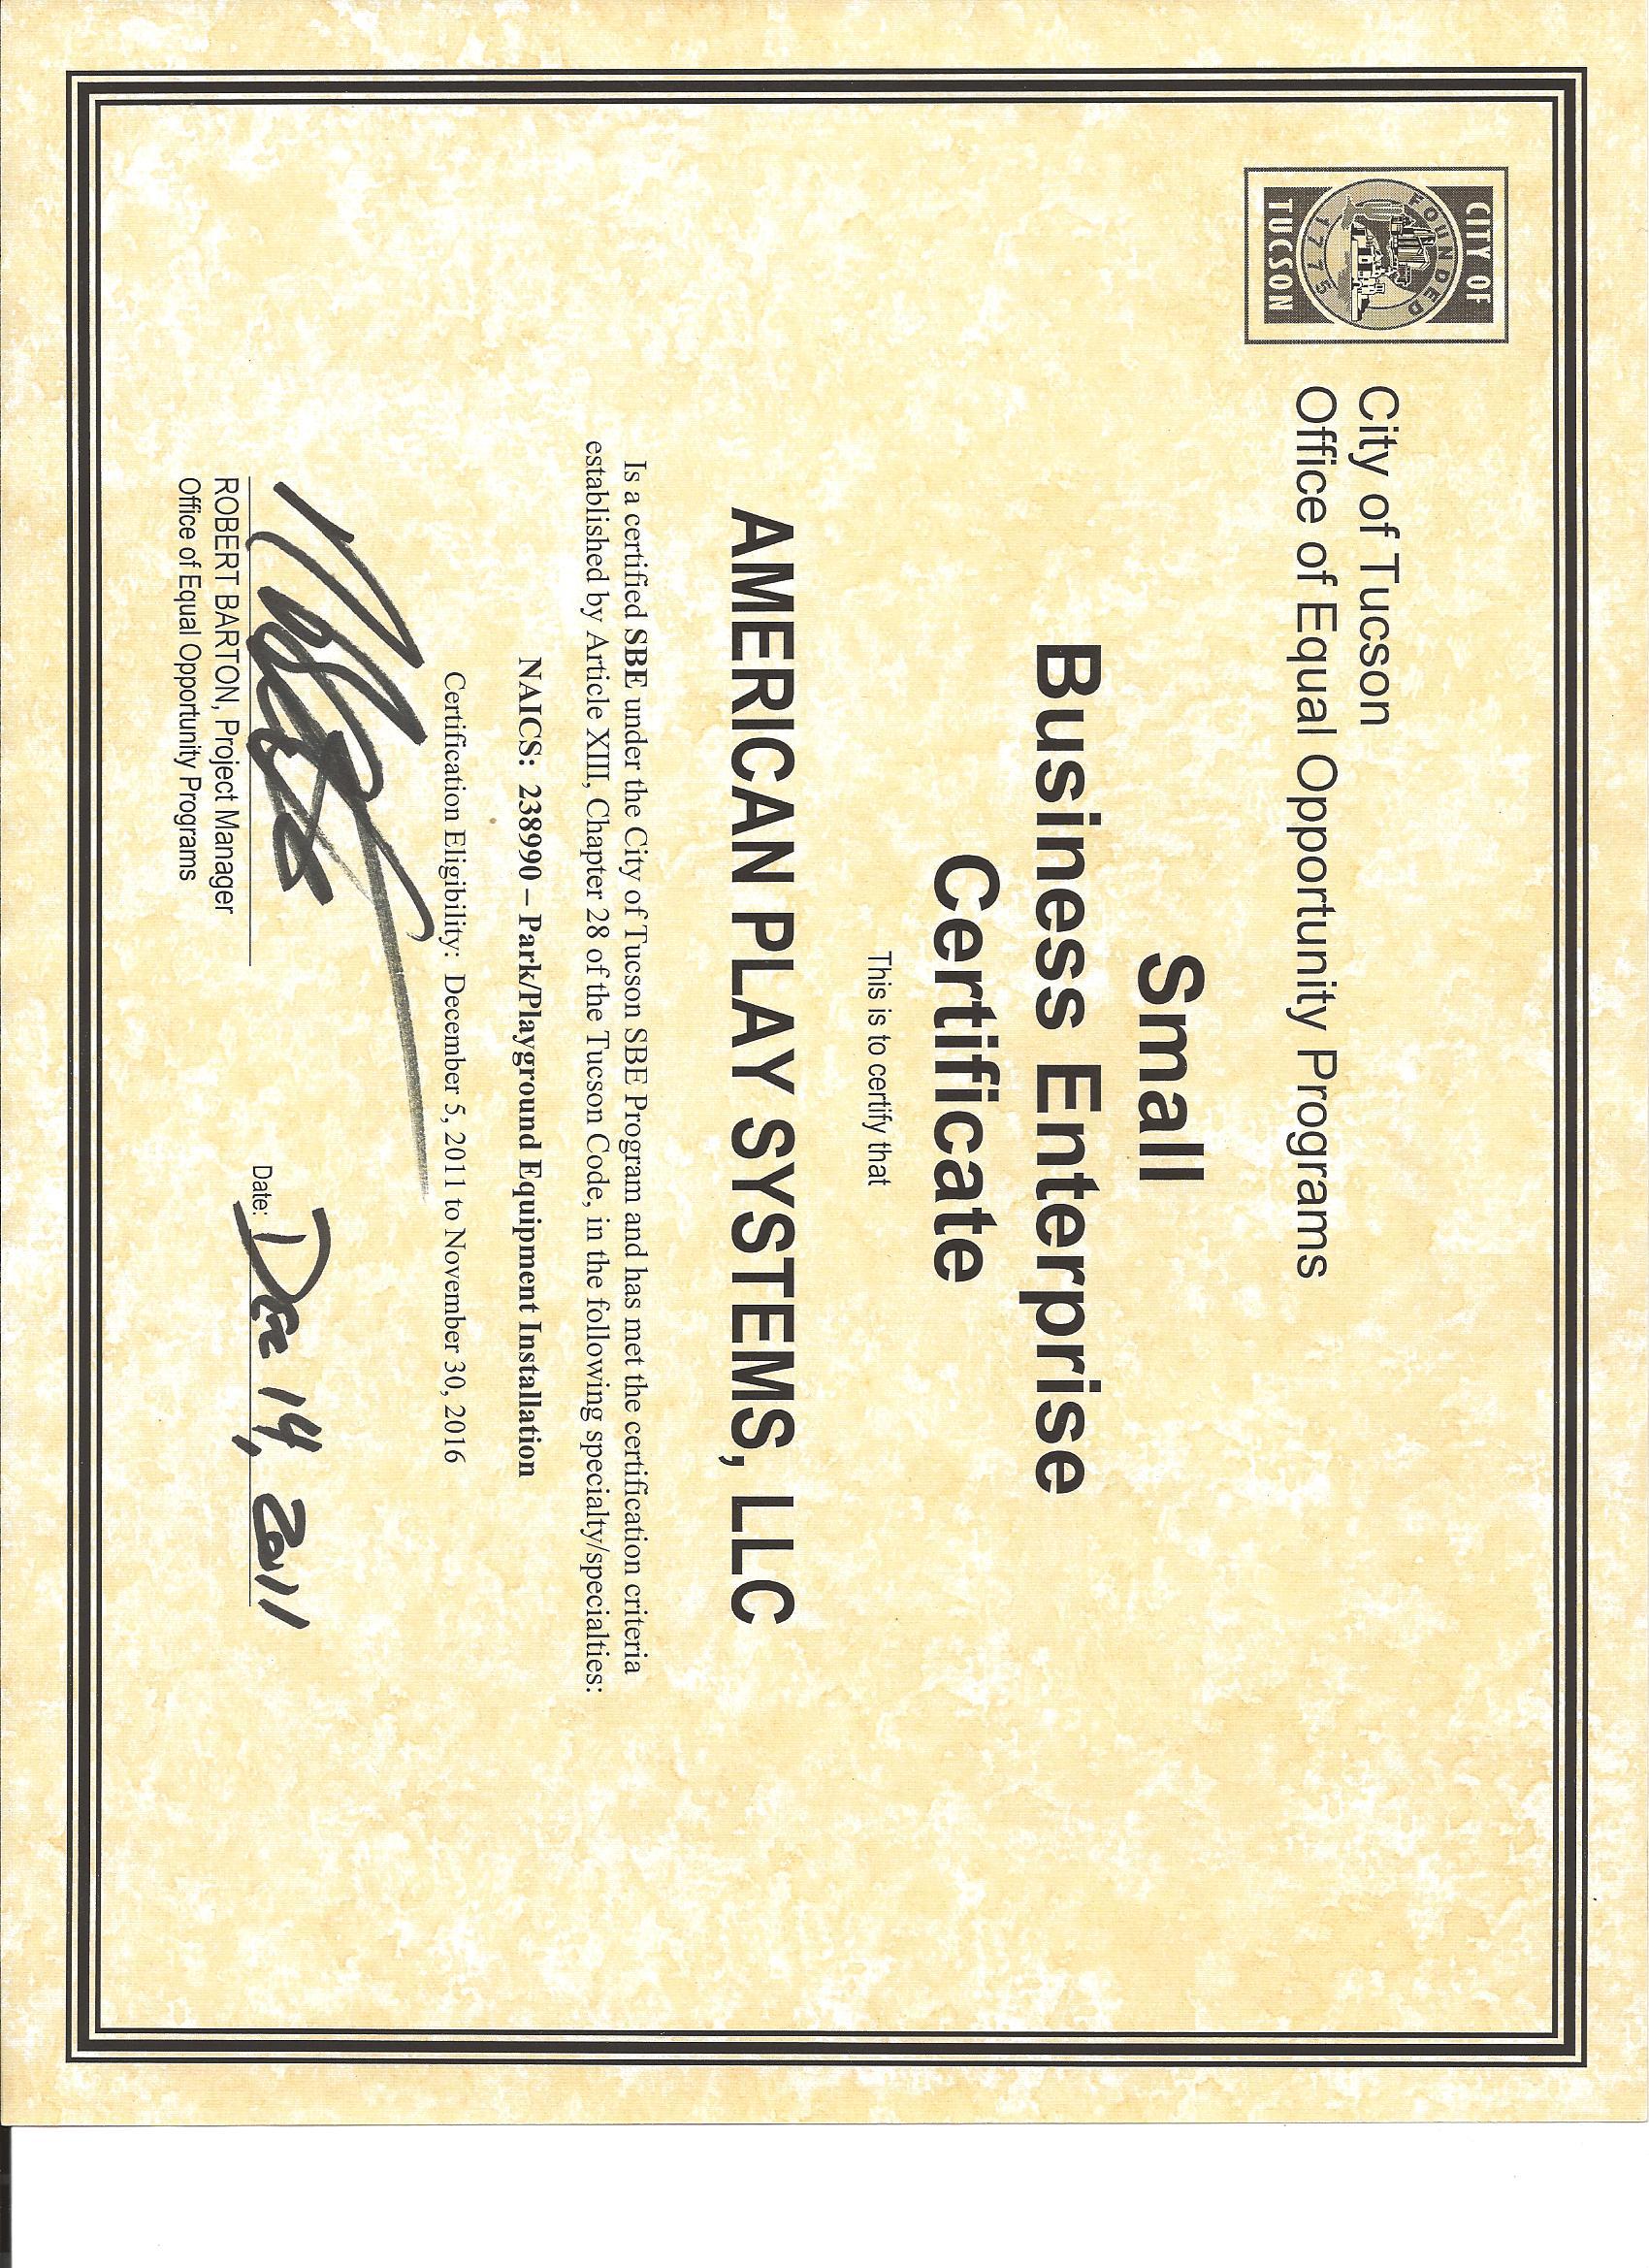 American Play Systems Llc Licenses Insurance Bonding